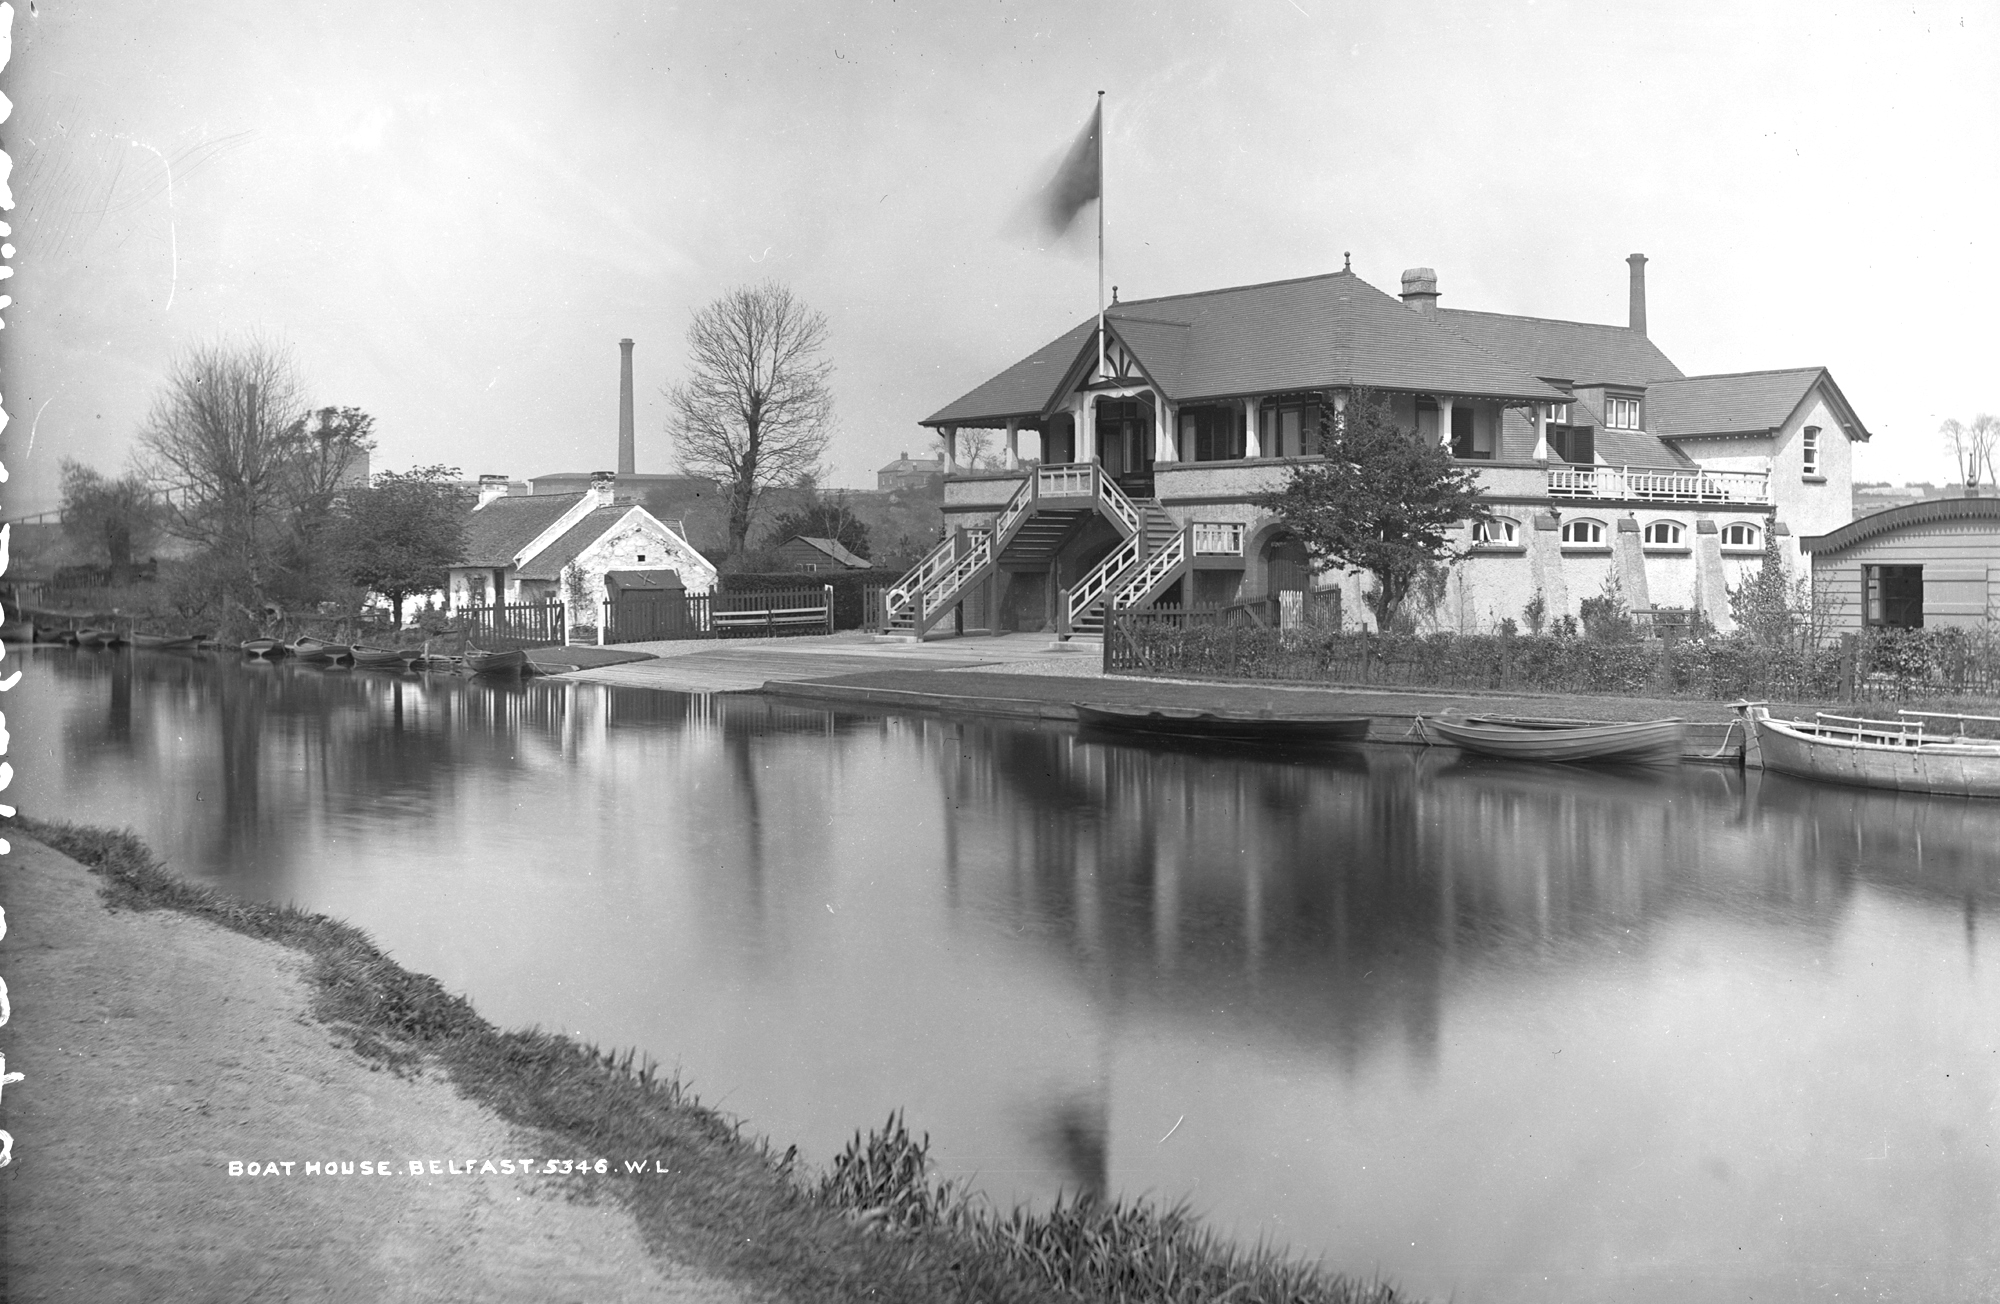 Boat House, Belfast, Co. Antrim